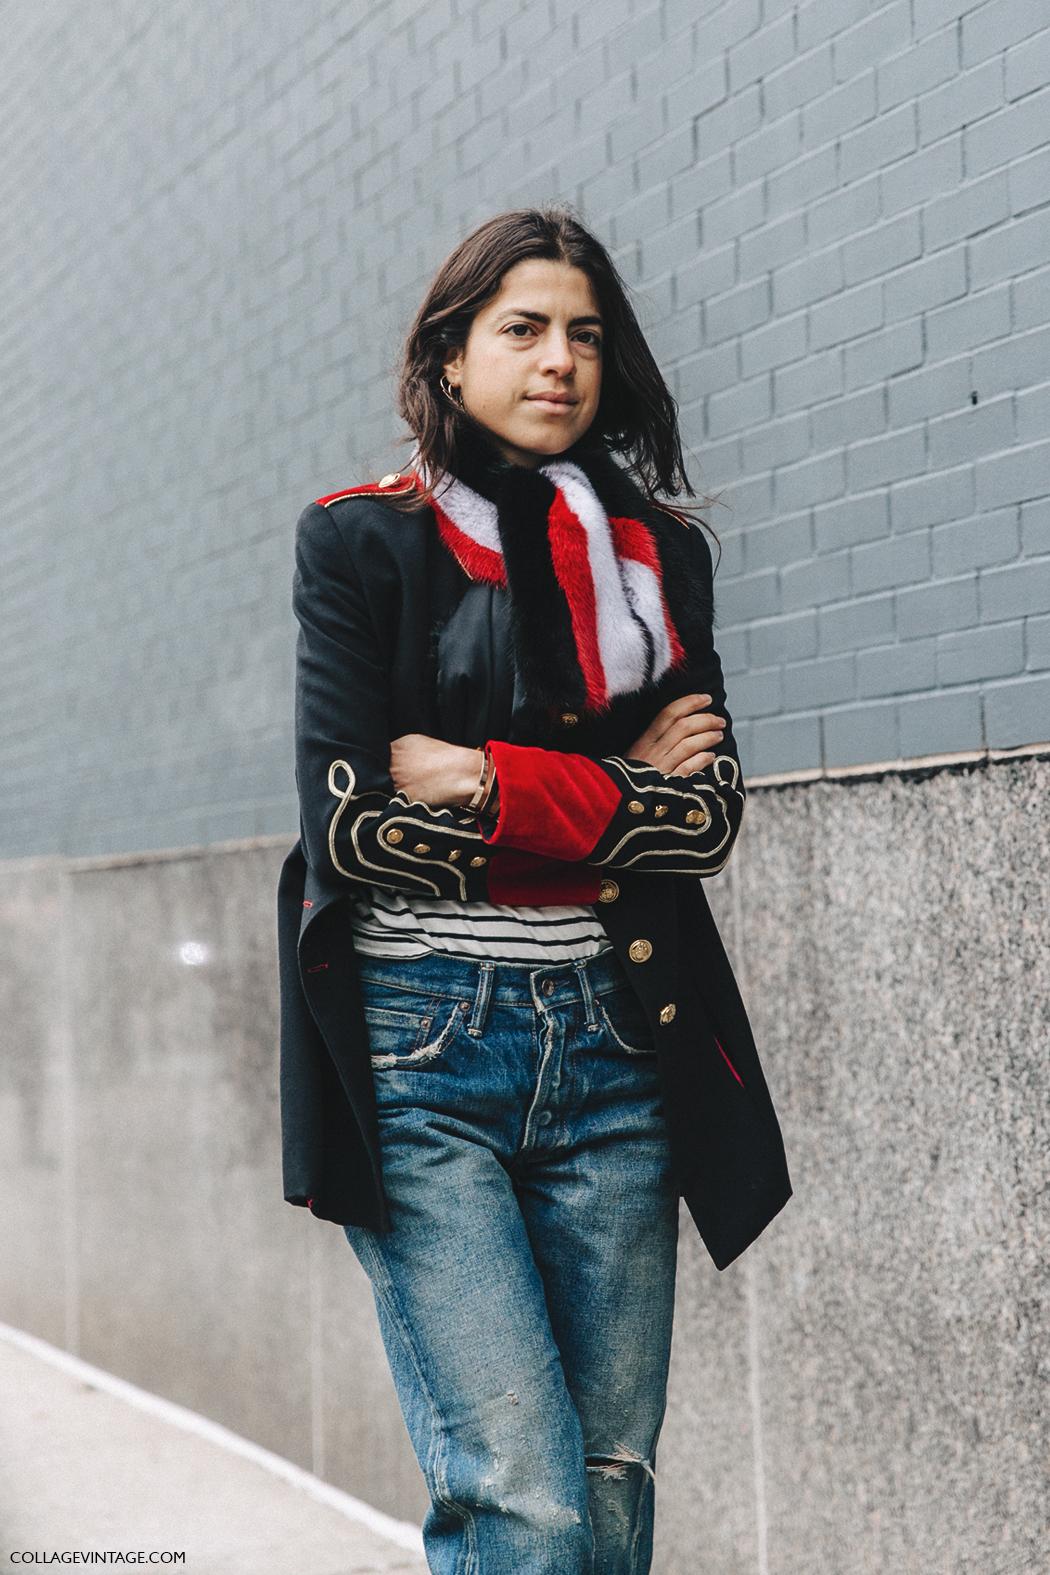 NYFW-New_York_Fashion_Week-Fall_Winter-17-Street_Style-Leandra_Medine-Man_Repeller-Jeans-Military_Jacket-5